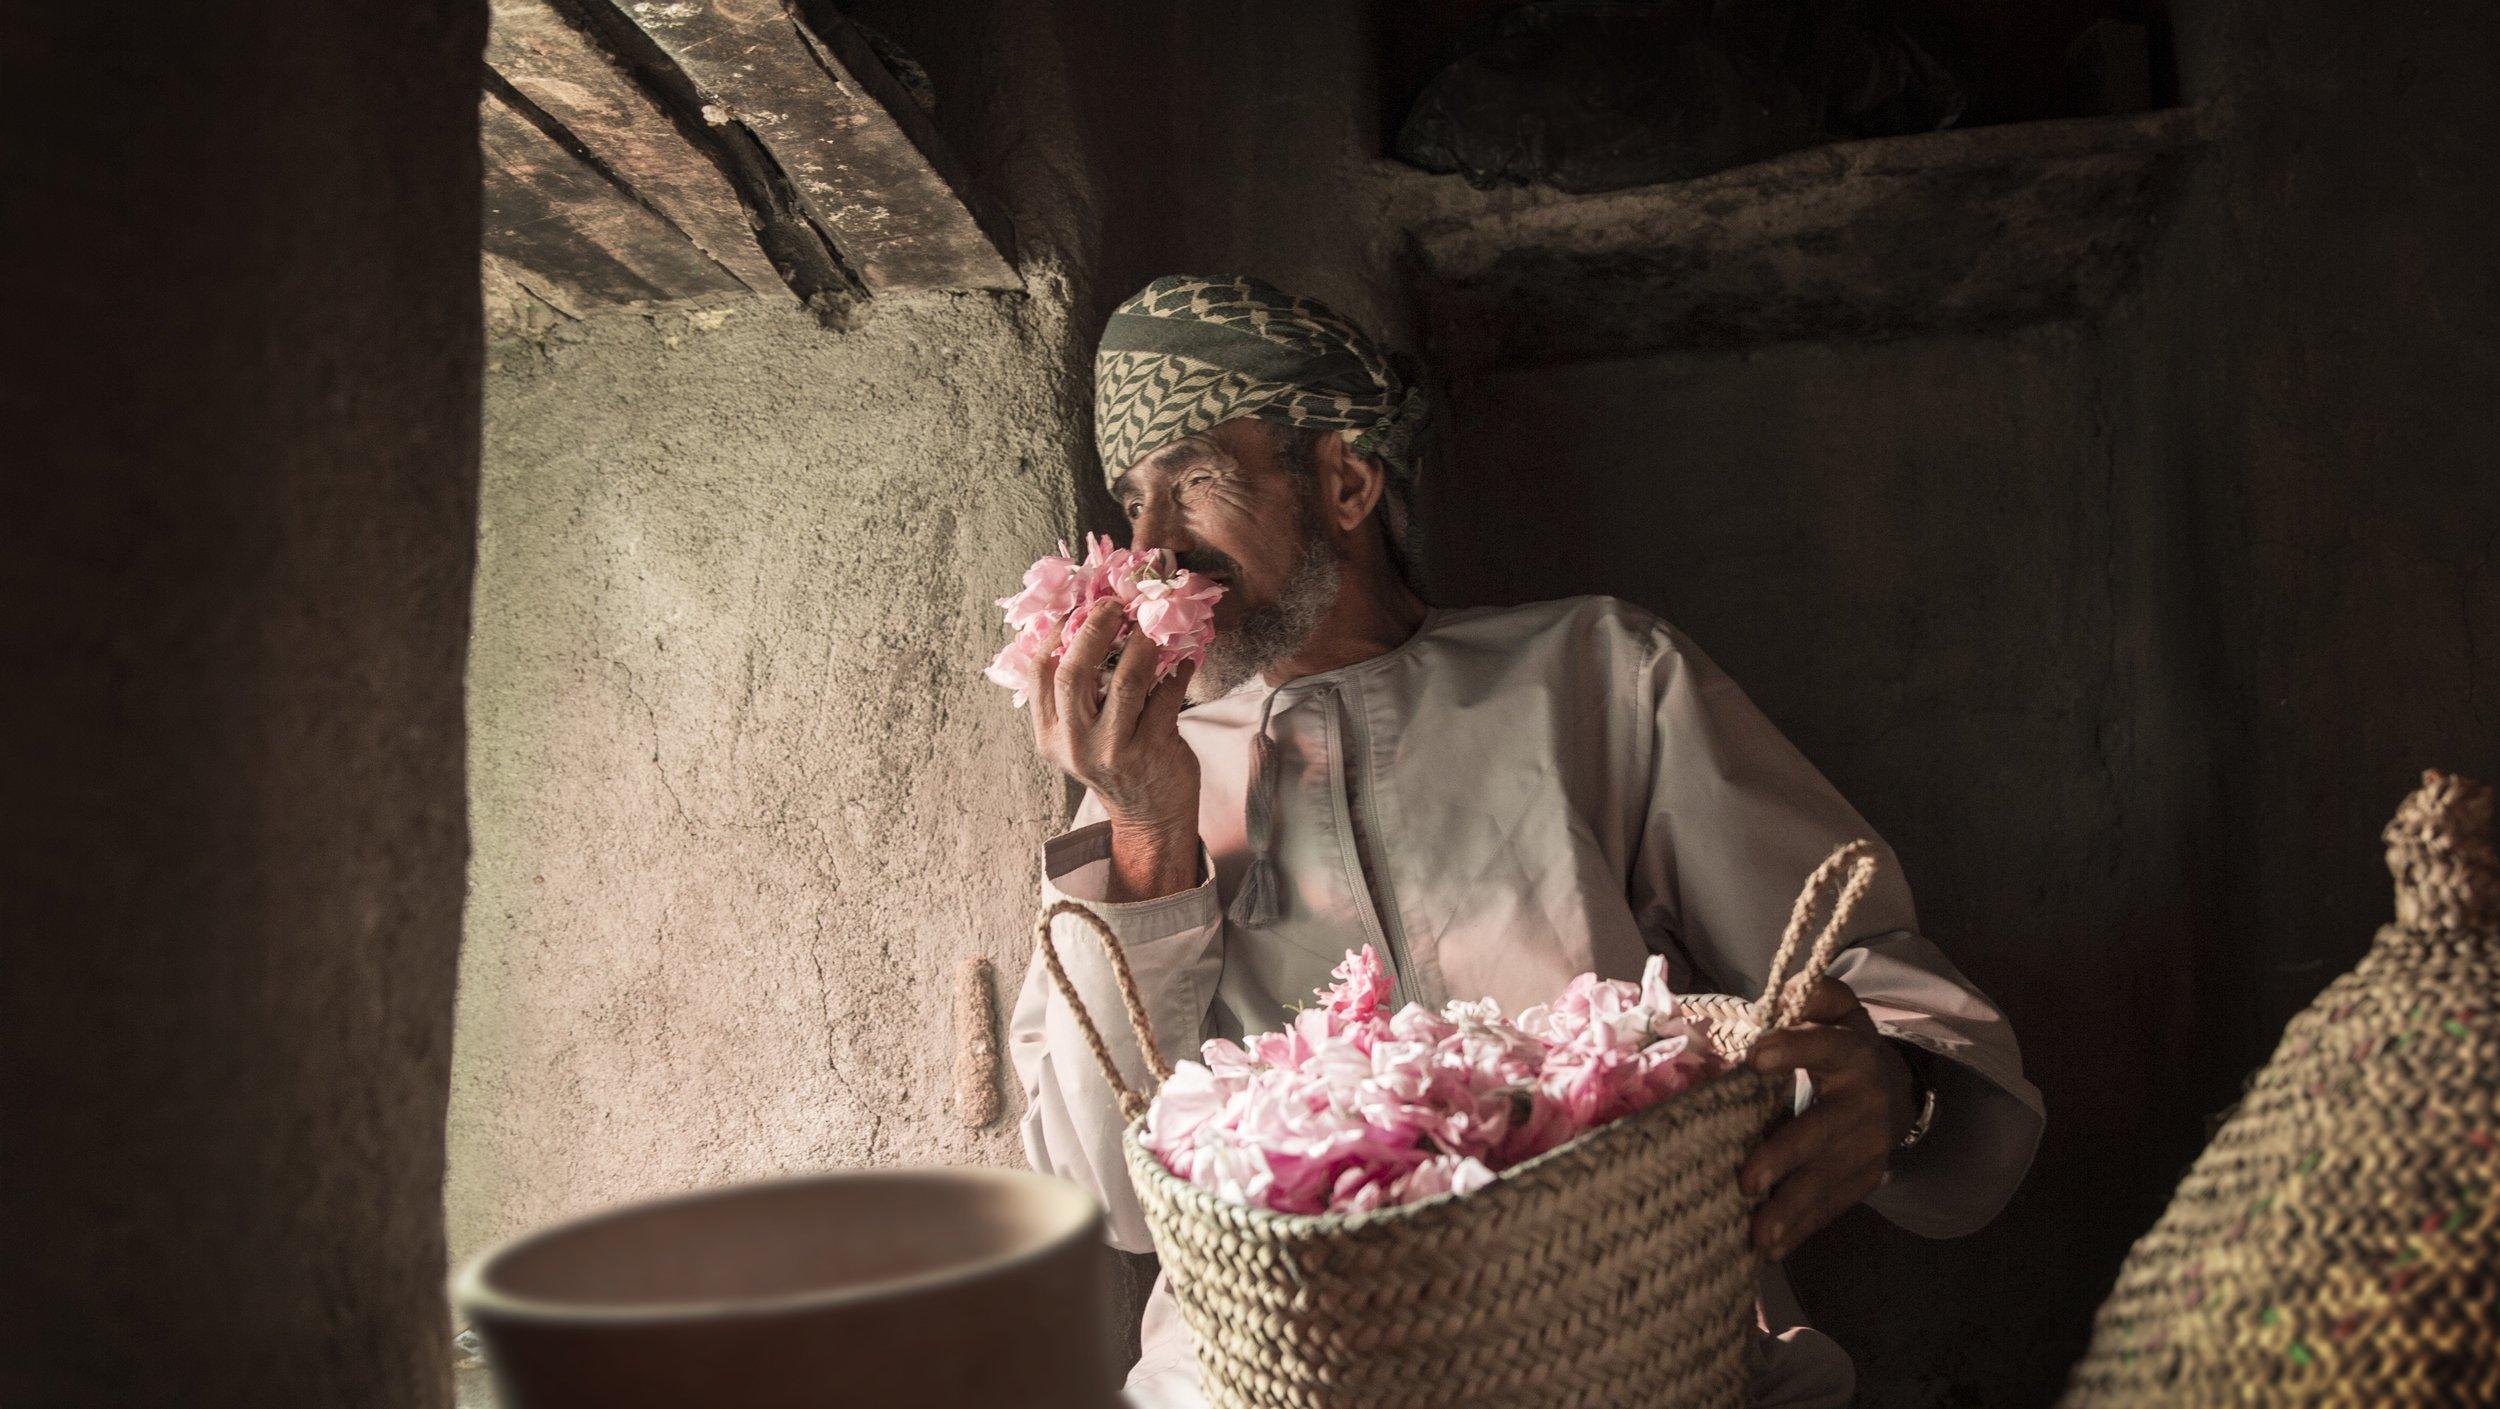 Anantara Al Jabal Al Akhdar Resort - Destination - Roses Water Distellery 01.jpg